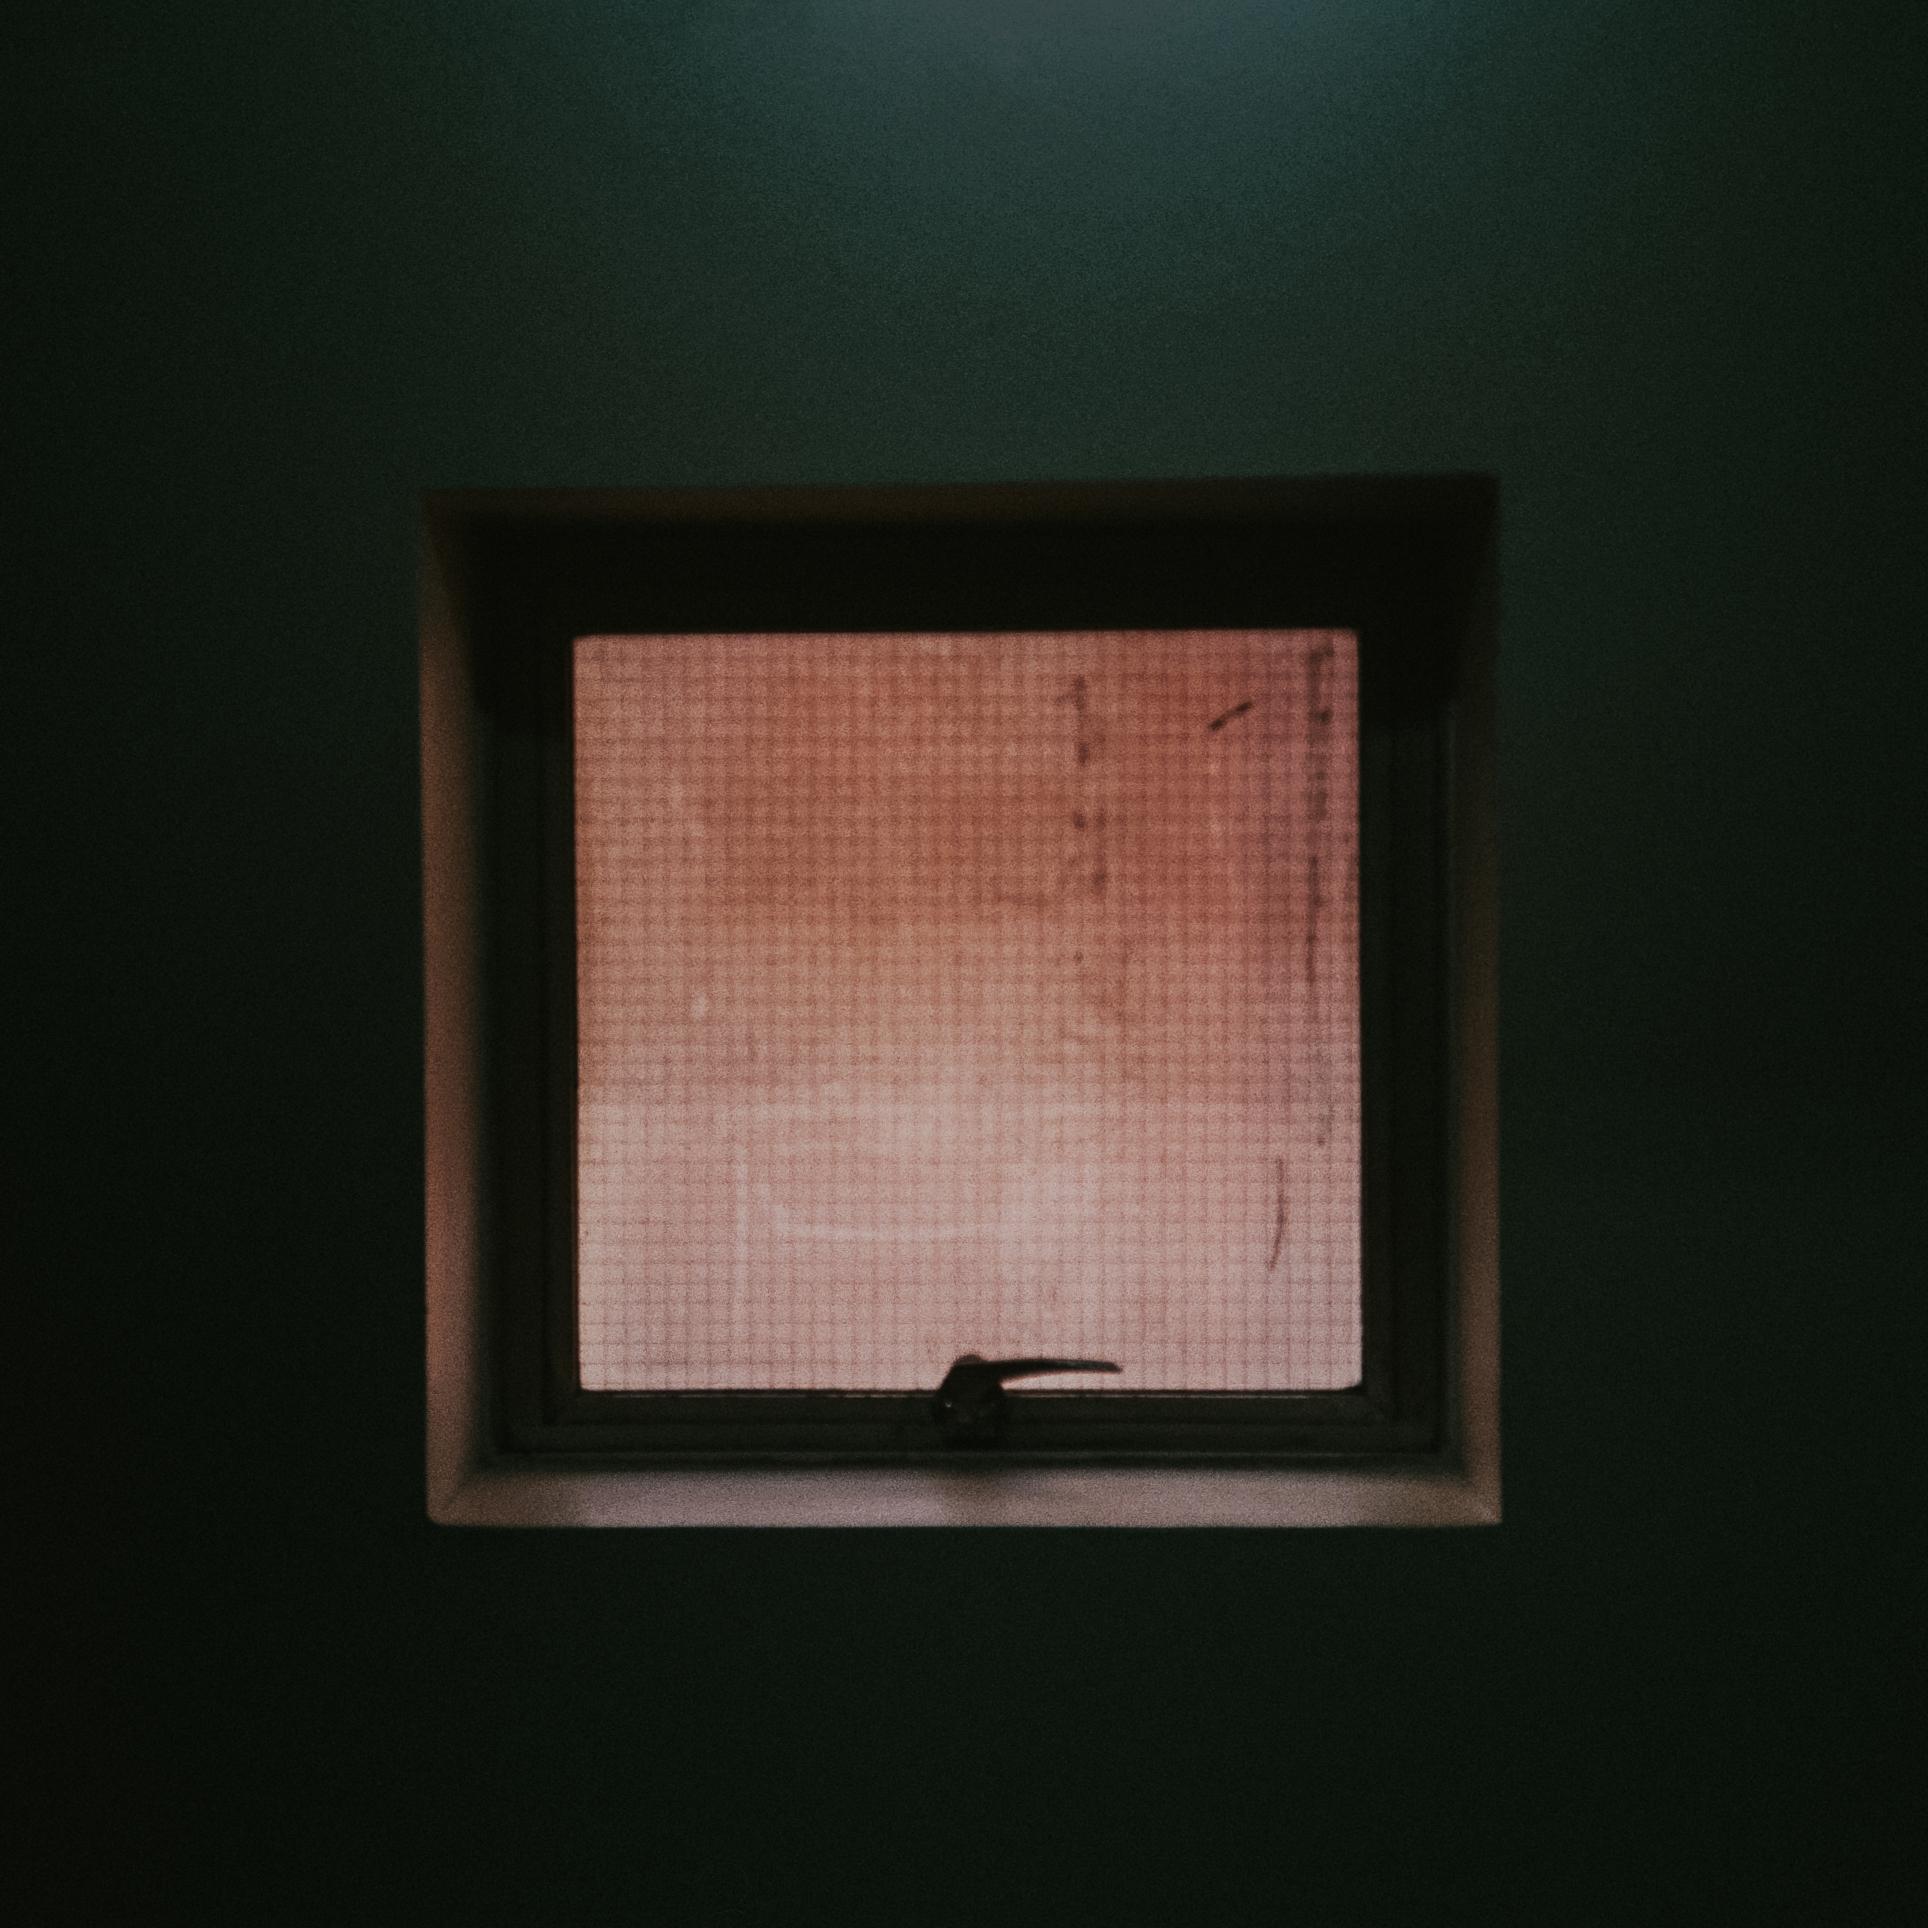 The Path into Light Seems Dark | David Little | Pentax Epsio Mini | Fuji Superia Premium 400